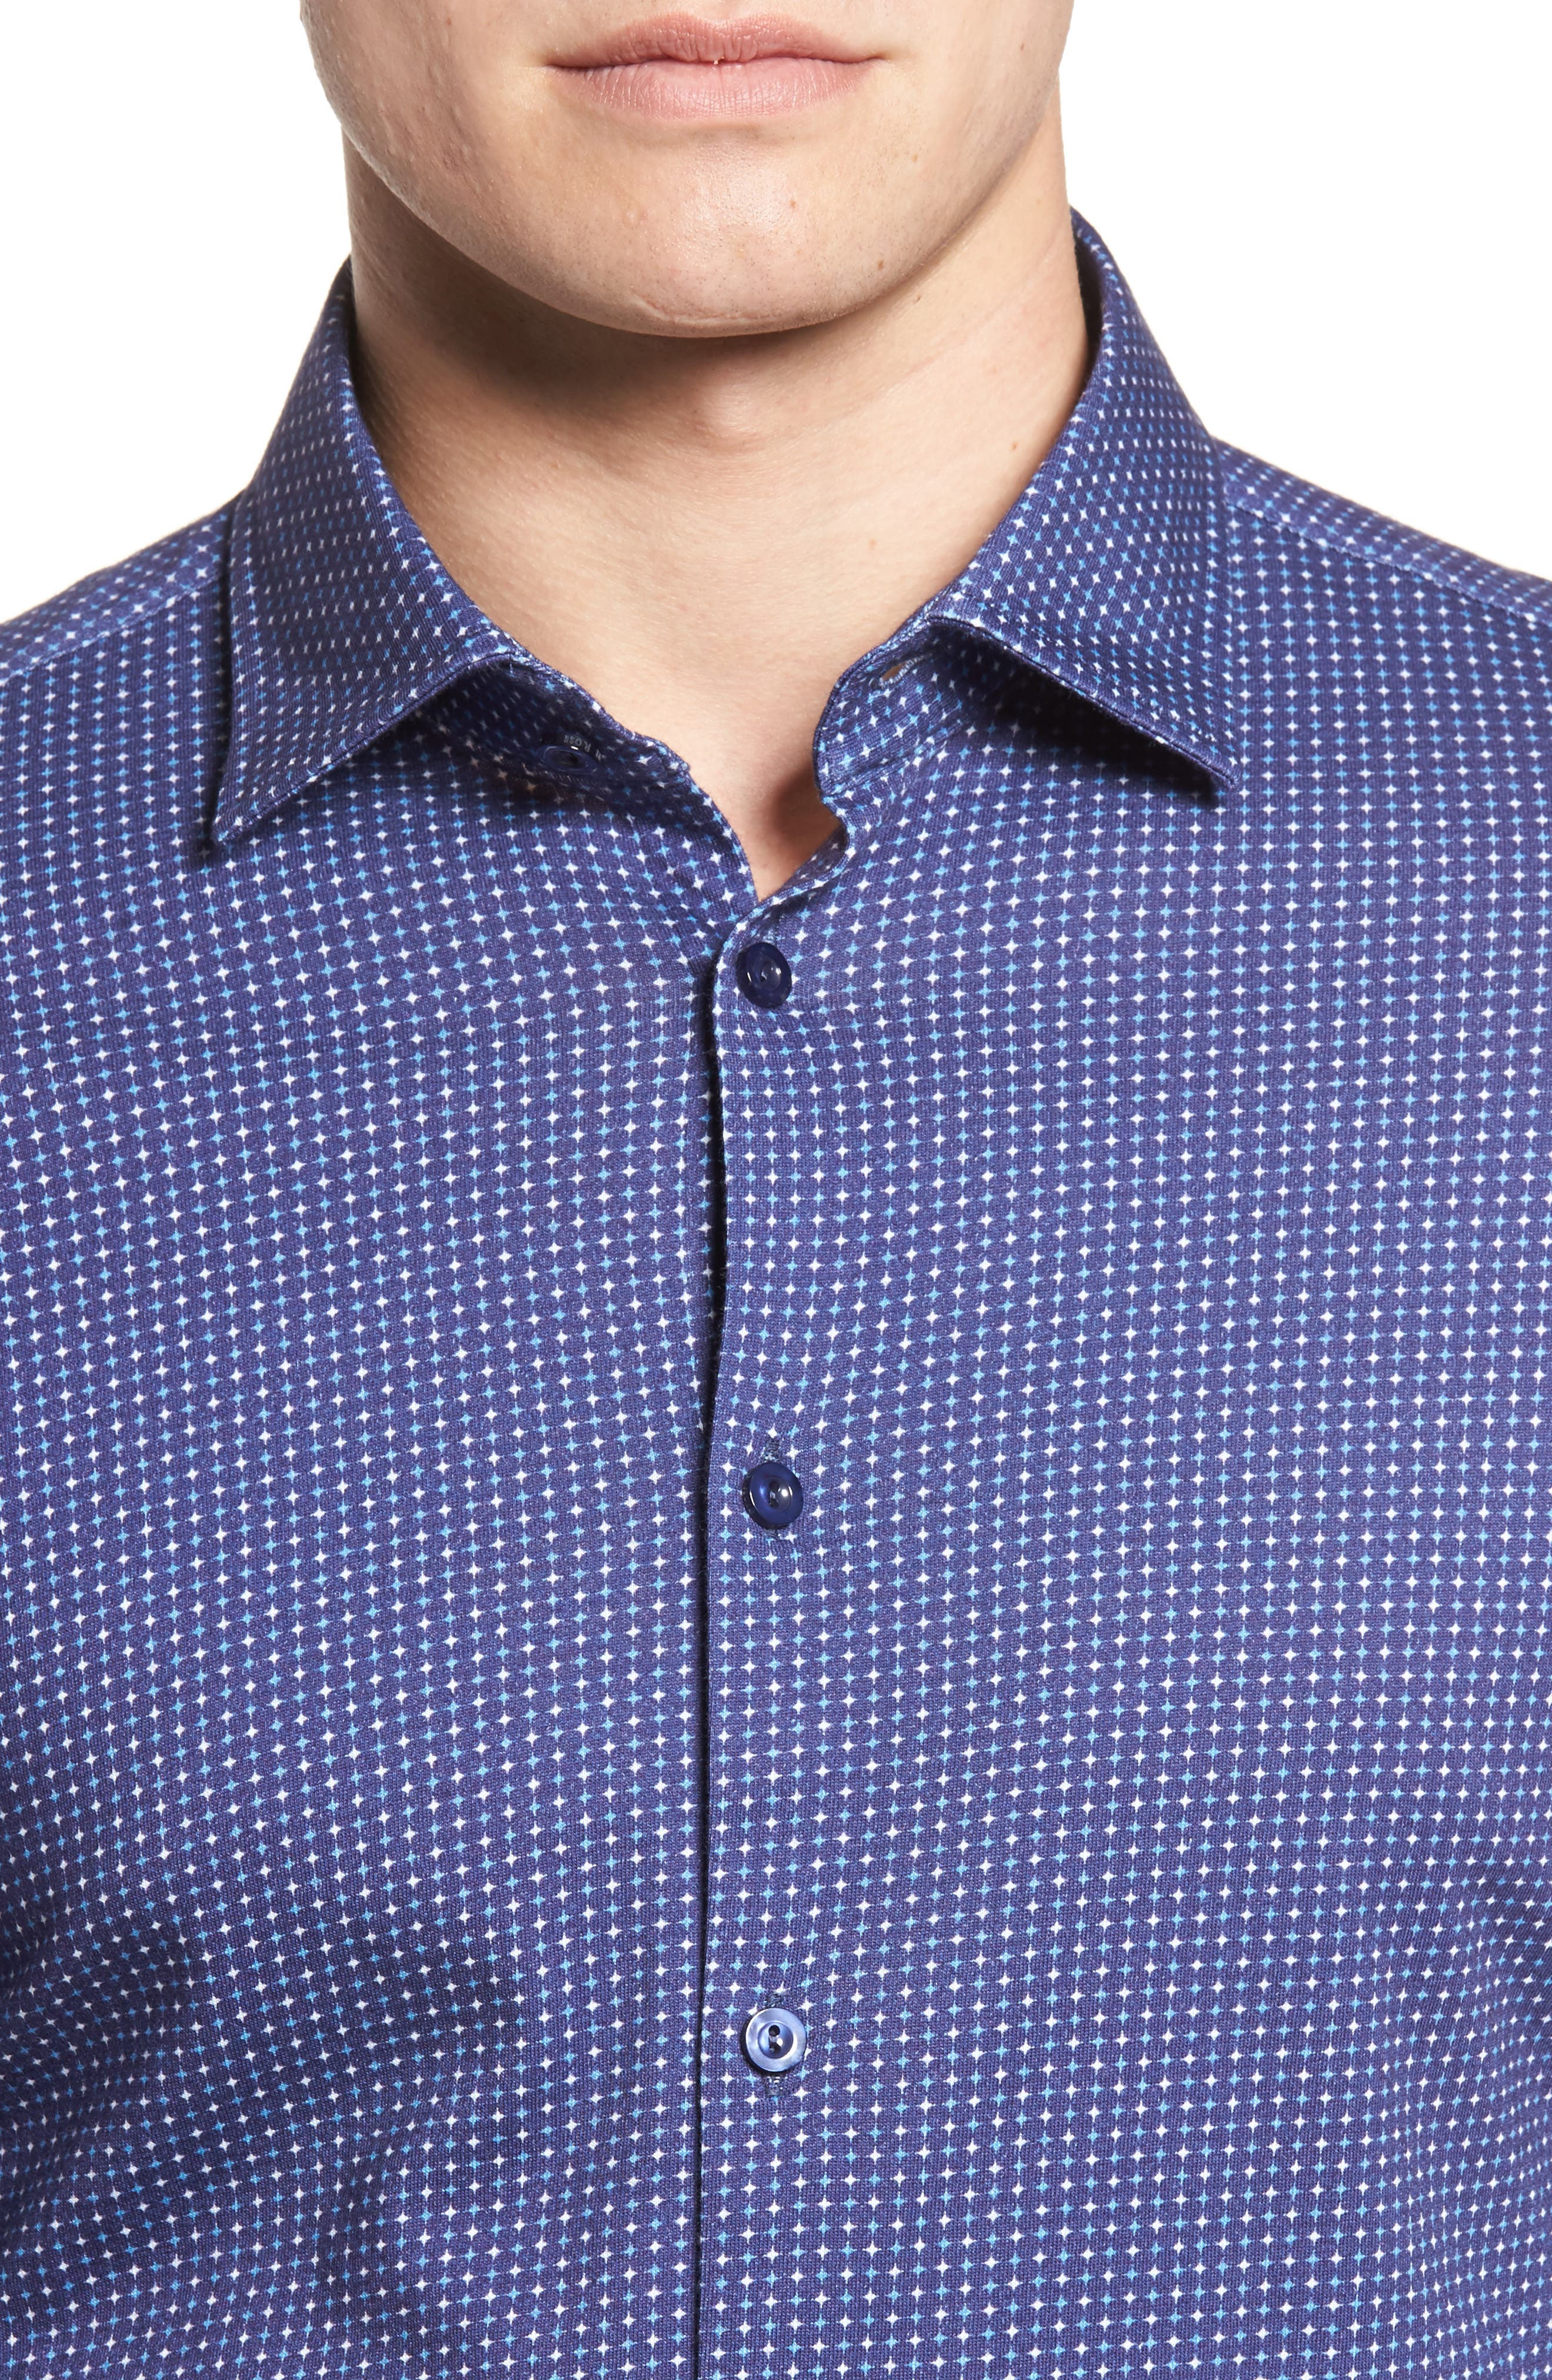 Star Geo Print Jersey Sport Shirt,                             Alternate thumbnail 2, color,                             Navy